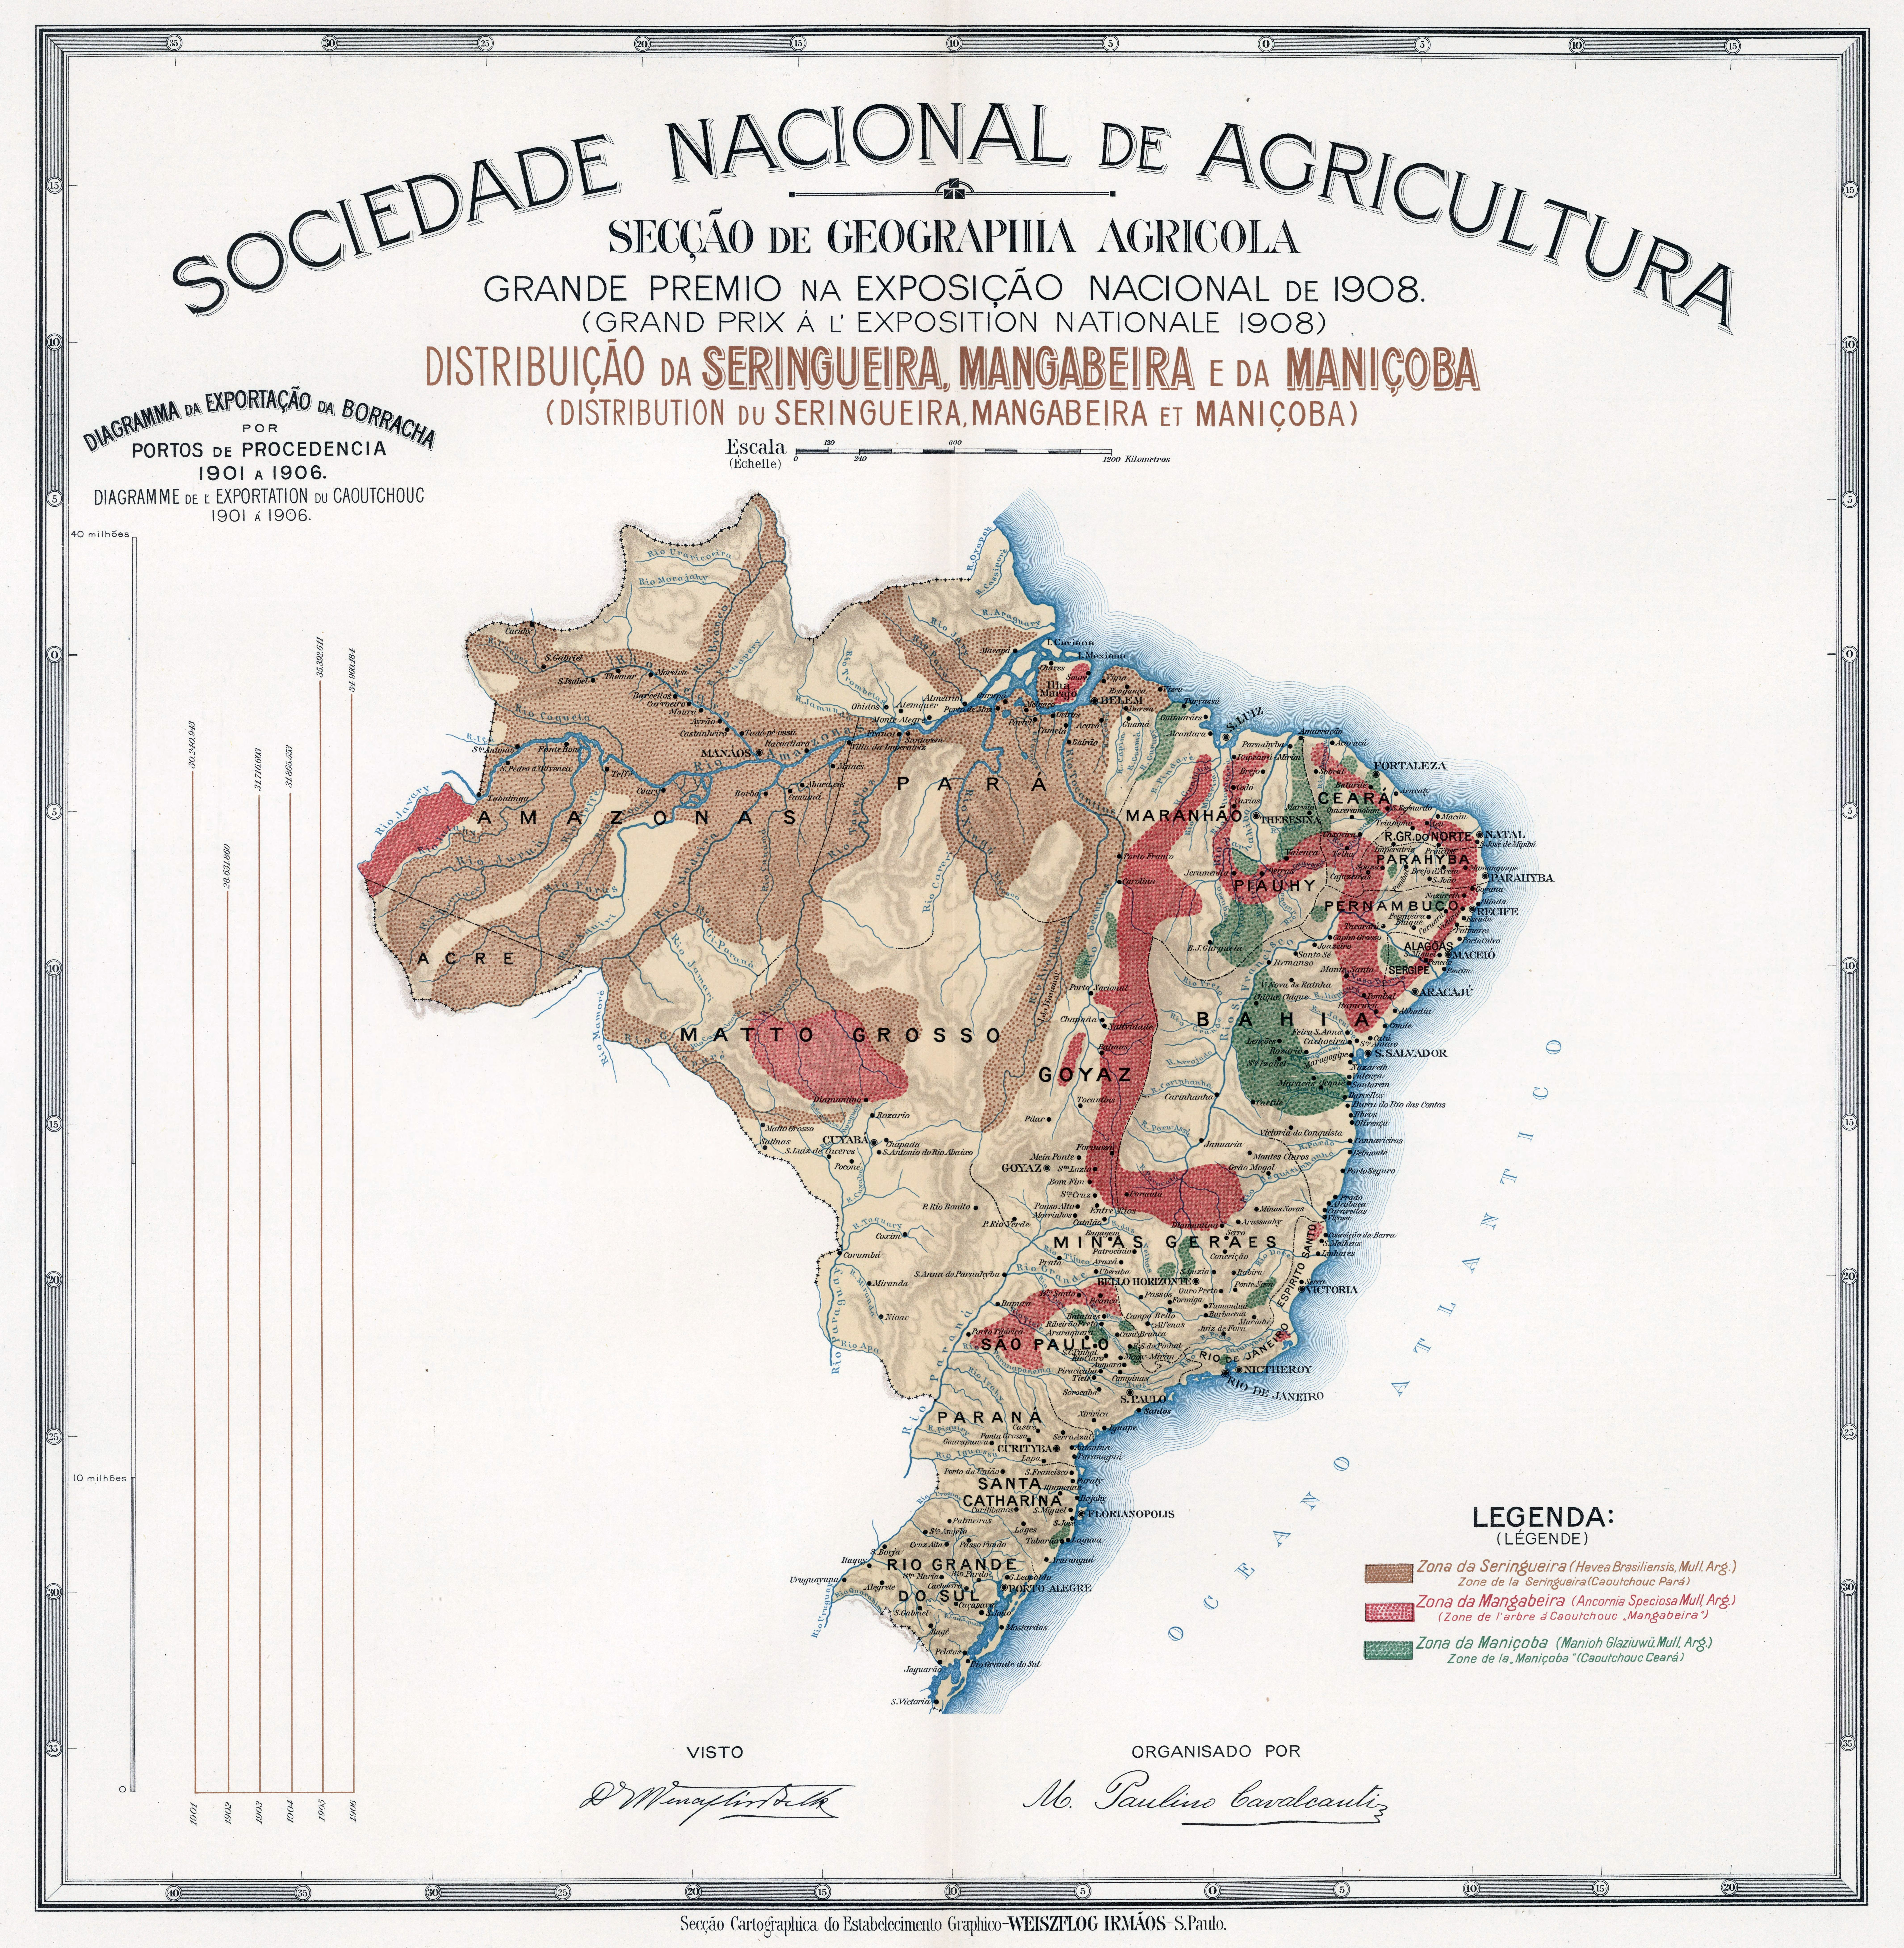 1908 Map Of The Rubber Tree Growing Regions In Brazil